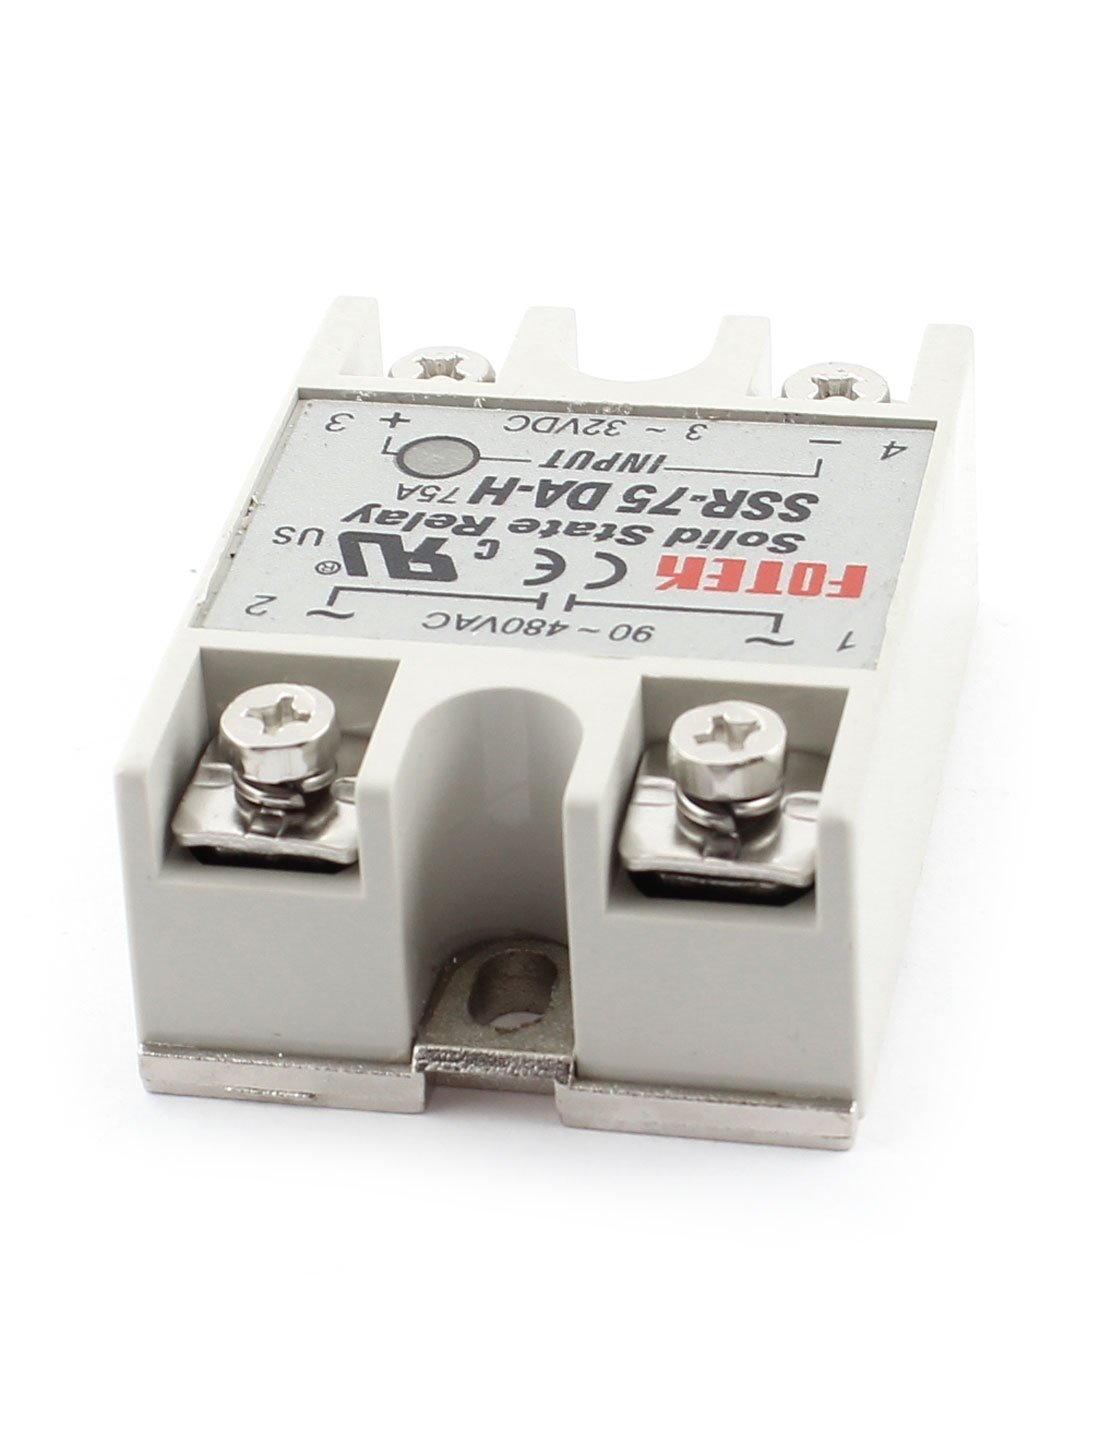 Power MOSFET 500V 7.2A TO-220FP STM NEW 2 pcs P9NK50ZFP 2 x STP9NK50ZFP